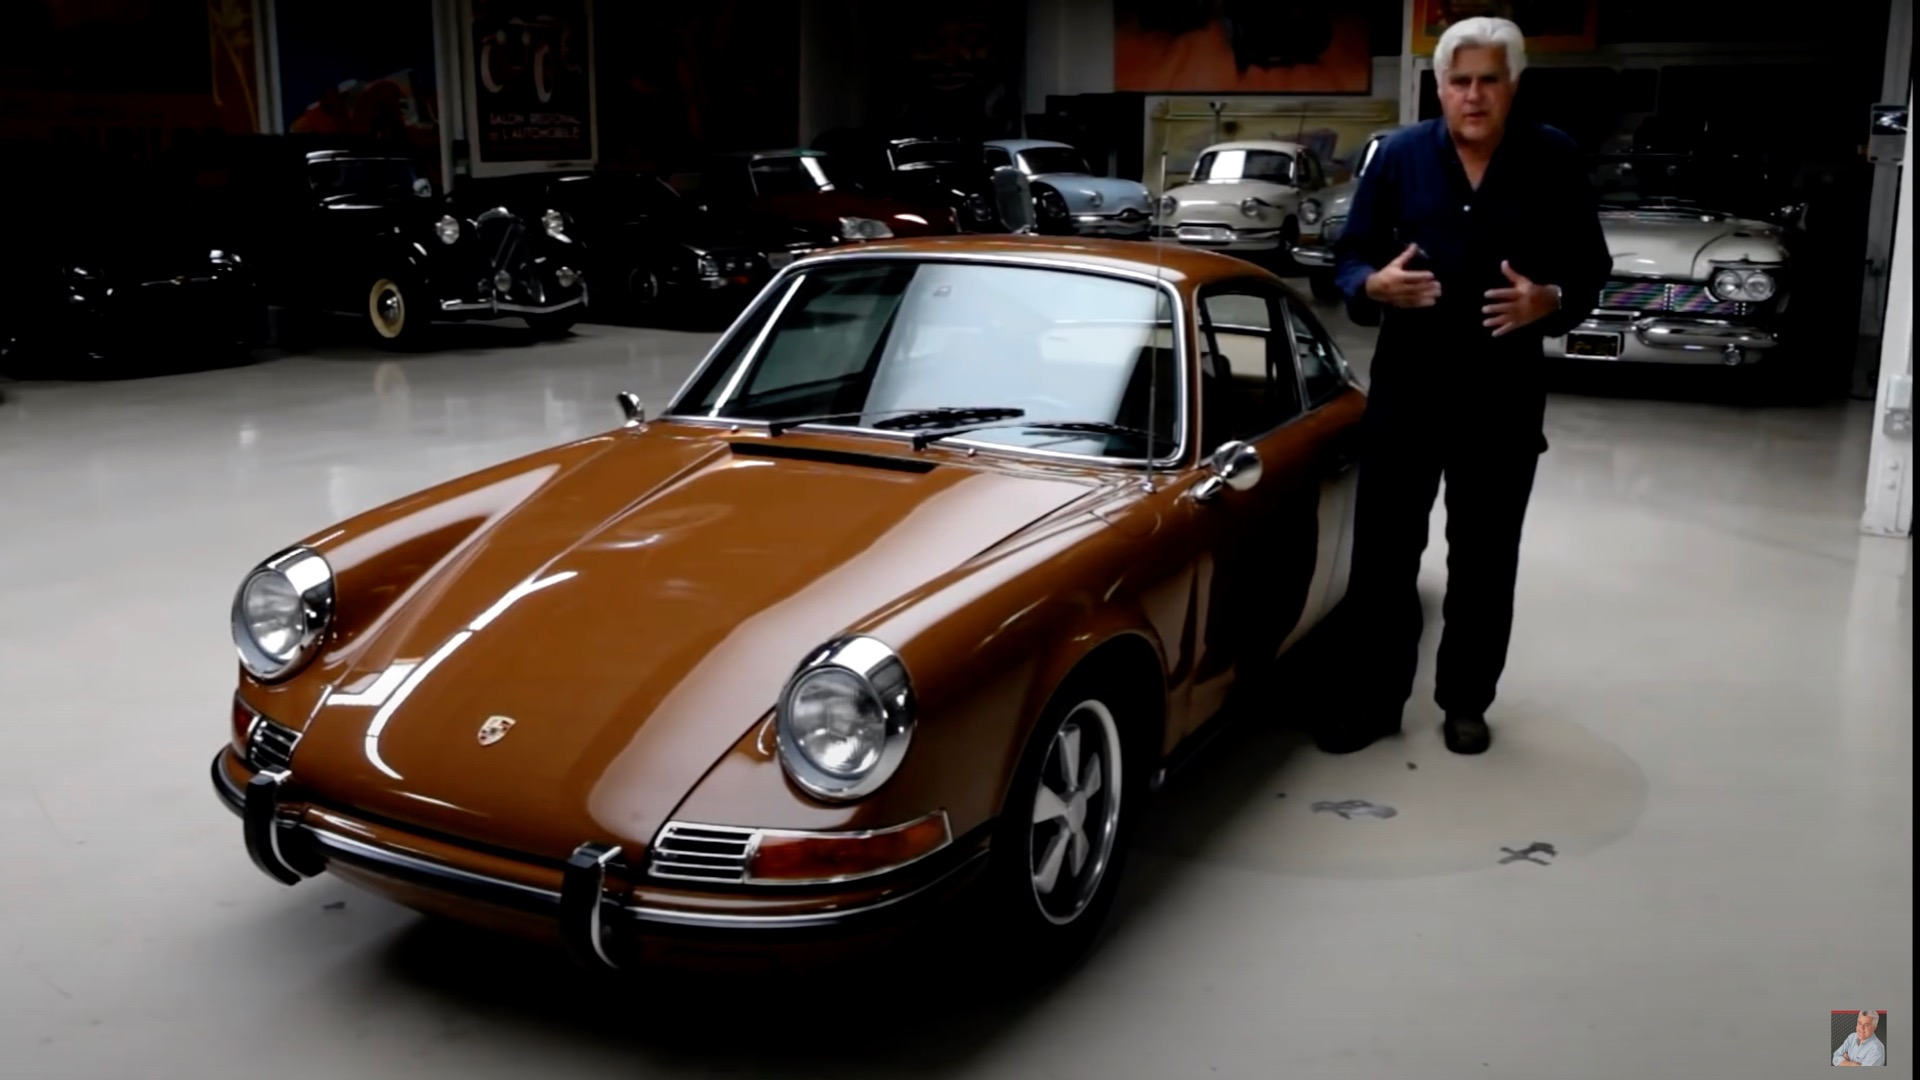 Jay Leno shows us his 1971 Porsche 911 T